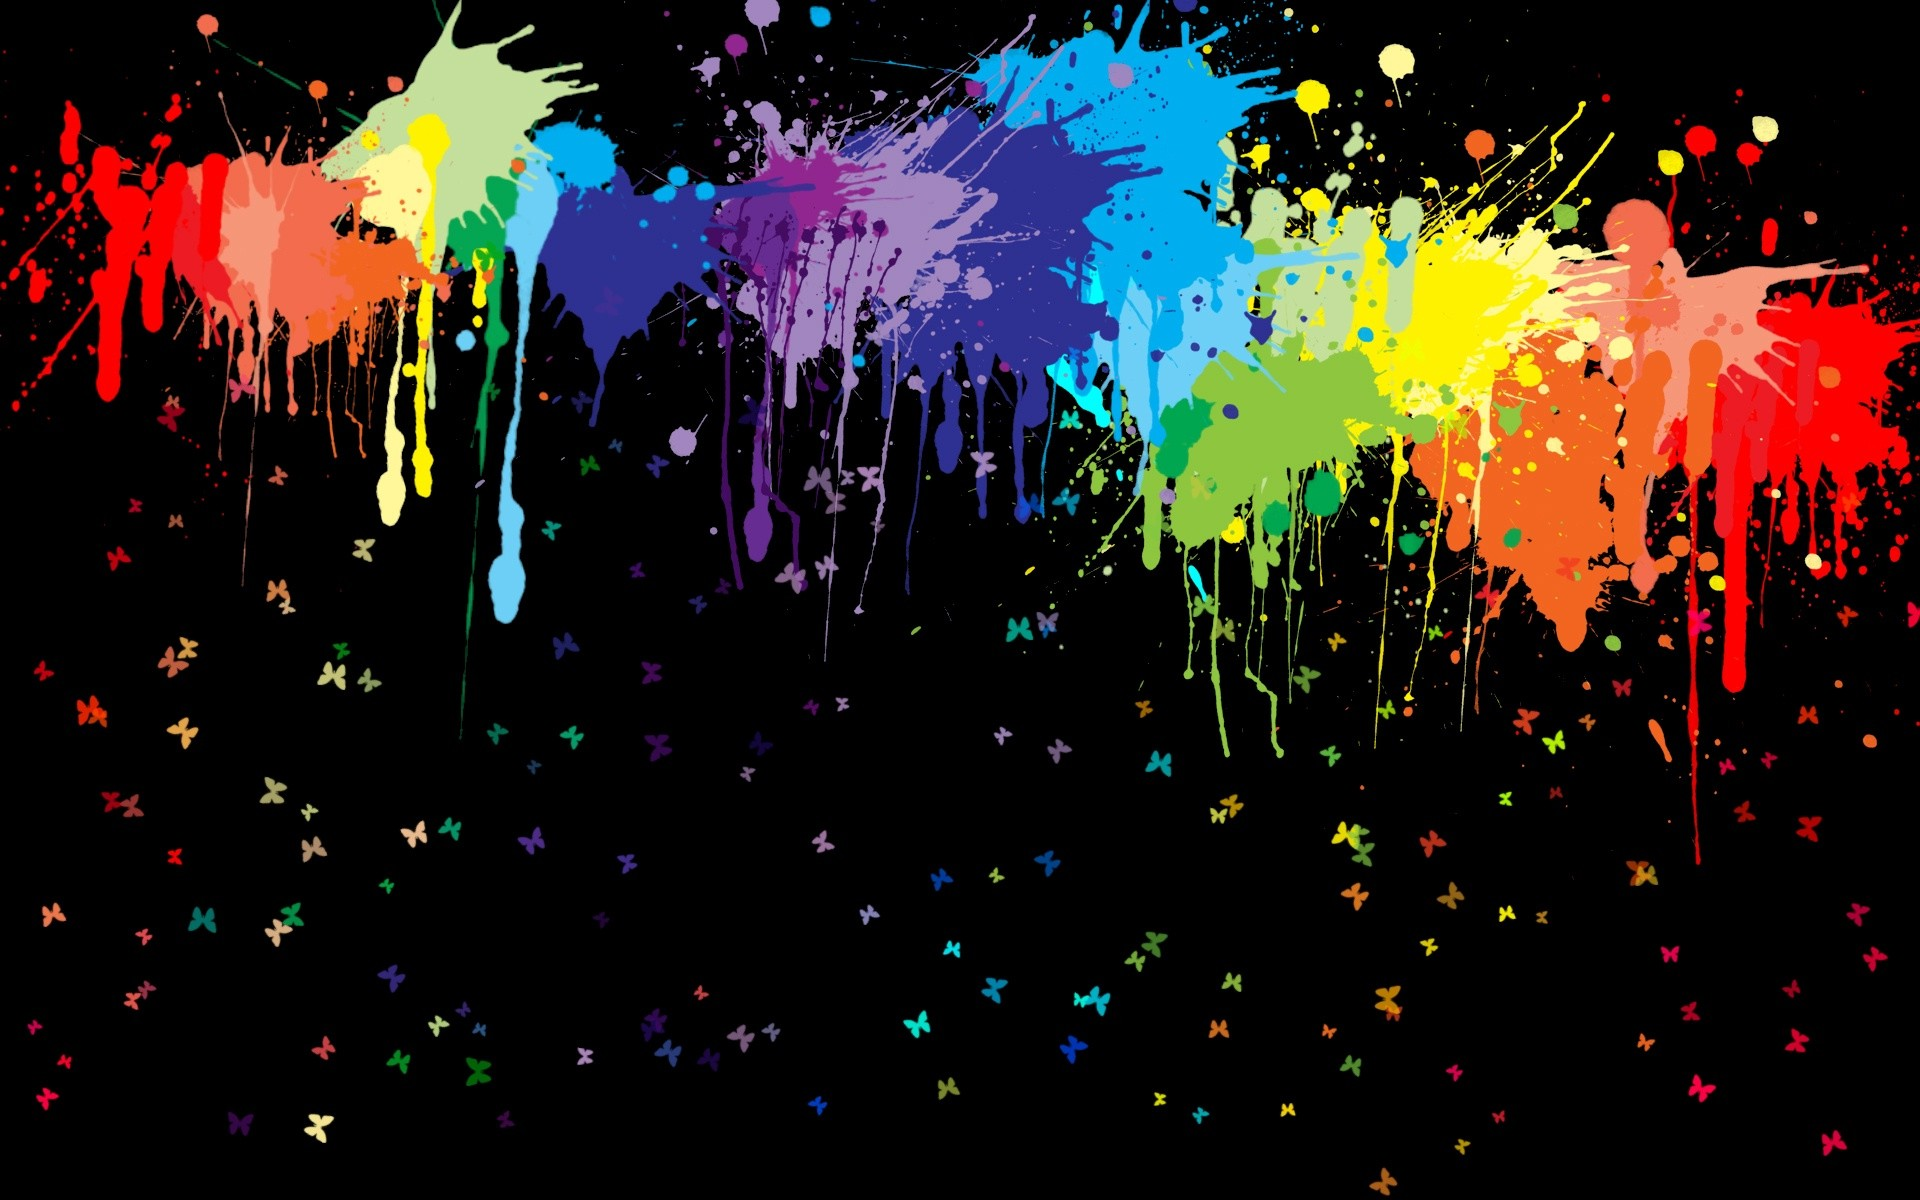 Paint Splashes Vector Background Designs HD Wallpaper 1920x1200